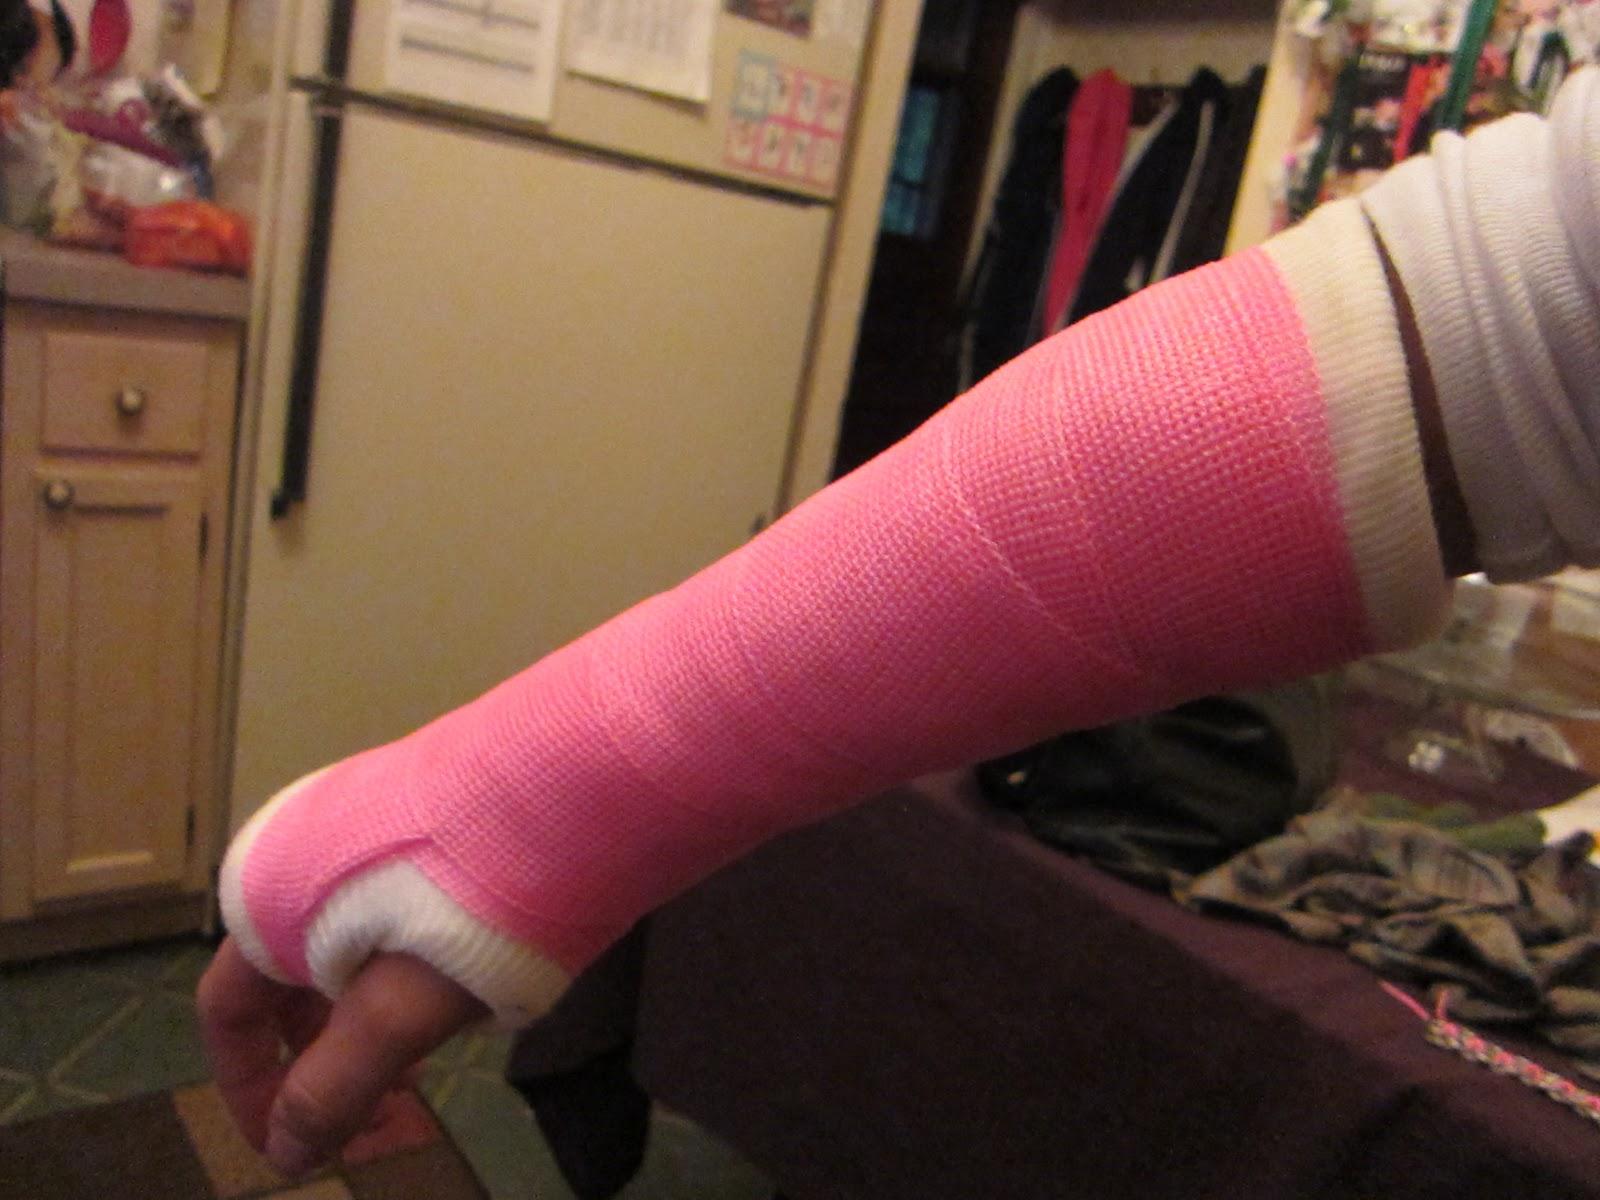 Wednesday, November 16, 2011